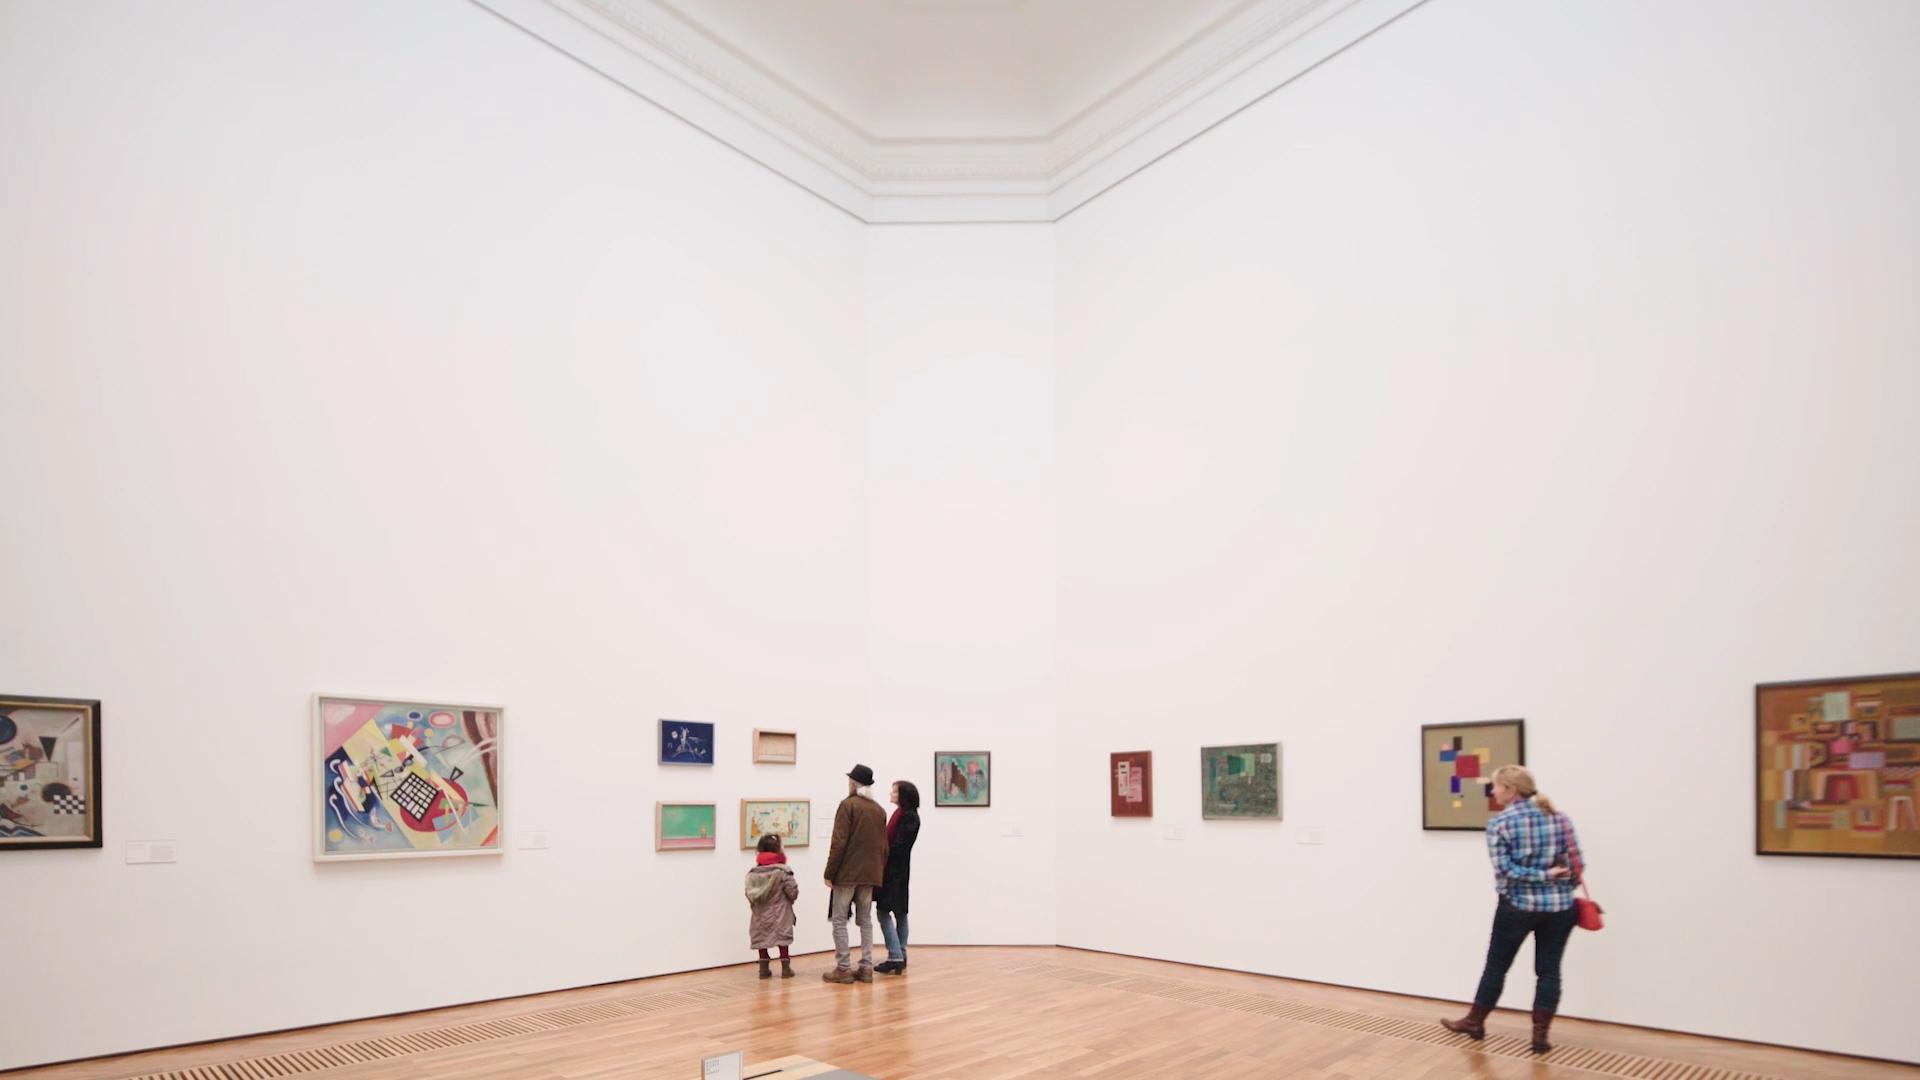 Musee d'arts de Nantes - Stanton Williams.mp4.00_02_32_14.Still014.jpg